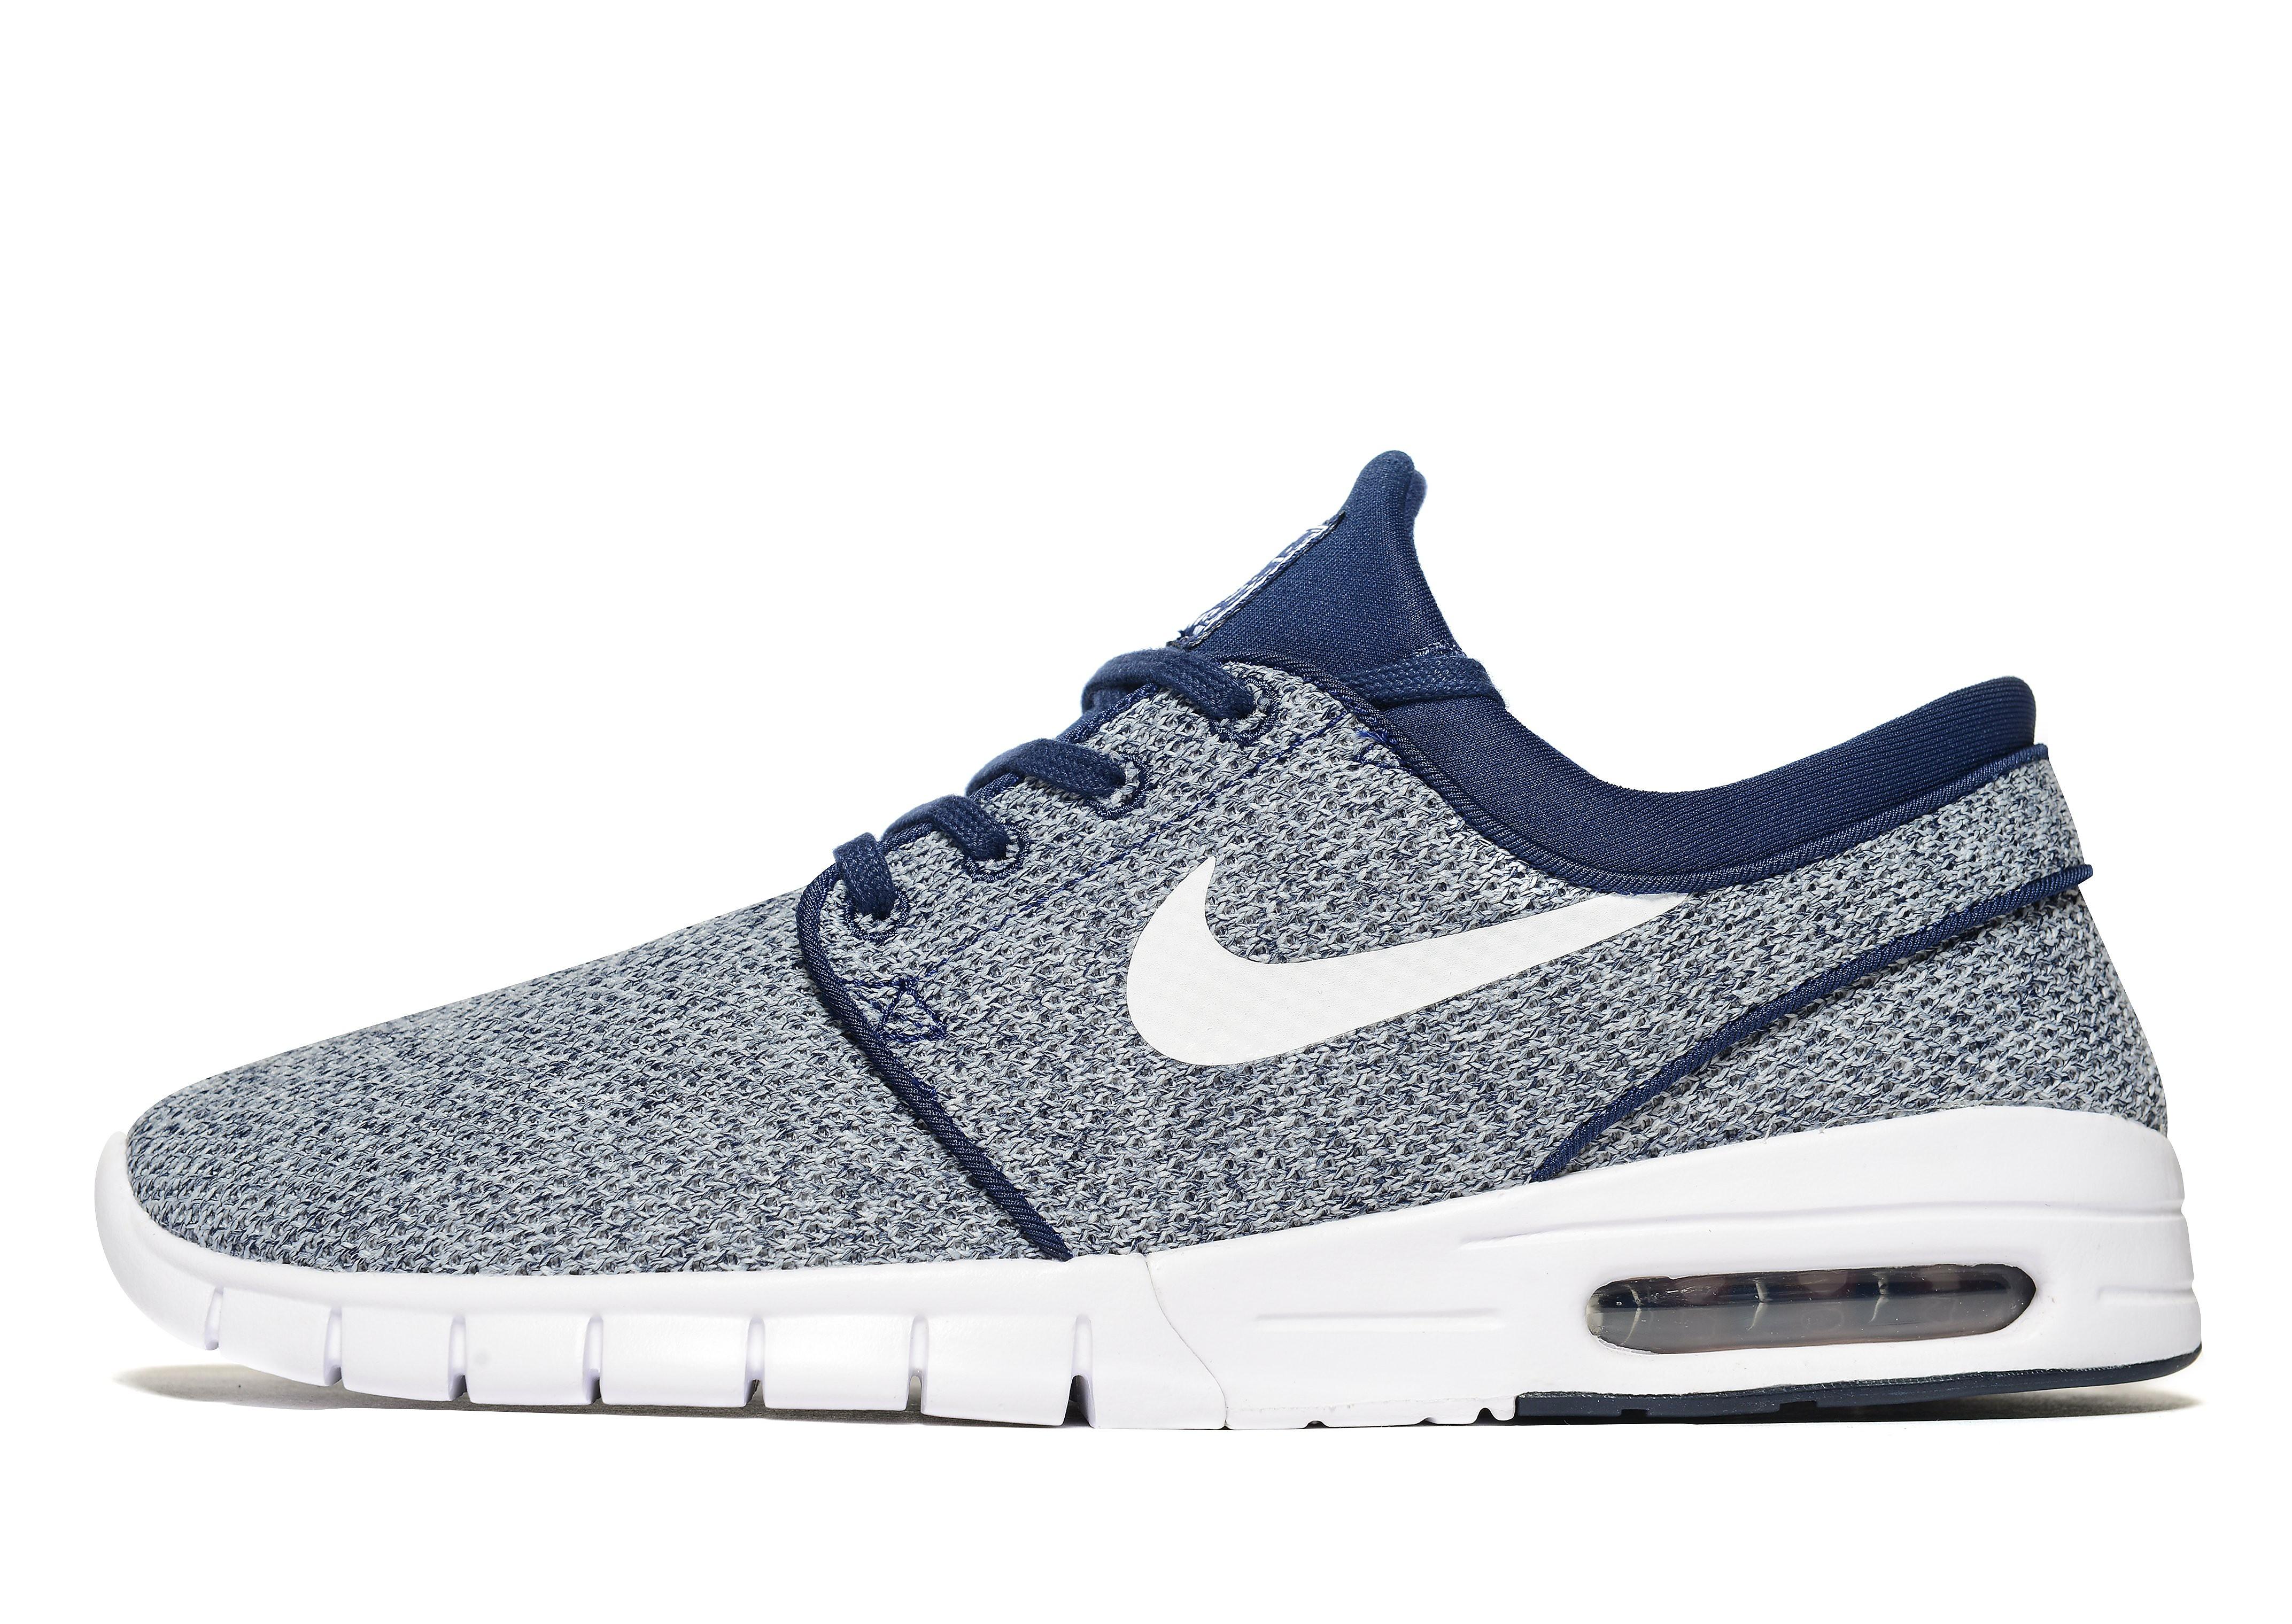 Nike SB Stefan Janoski Max - Blue/White, Blue/White